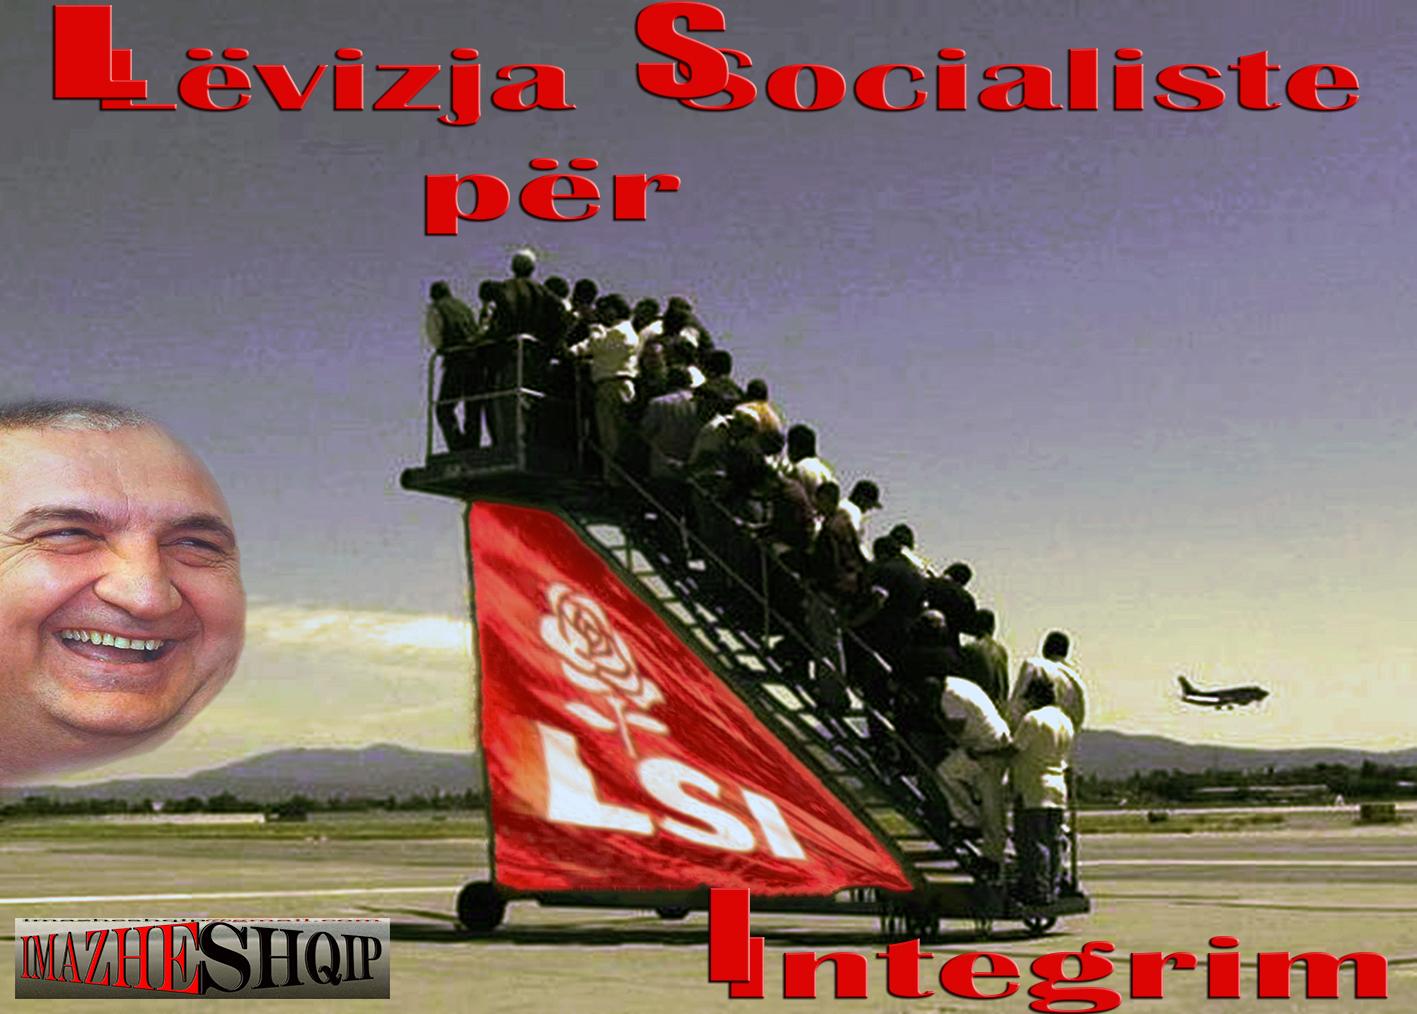 http://1.bp.blogspot.com/-7FtPmtObKpE/UV8DbGoH6fI/AAAAAAAAAws/MJbnC48ZRio/s1600/L%C3%ABvizja+Socialiste+p%C3%ABr+Integrim.jpg